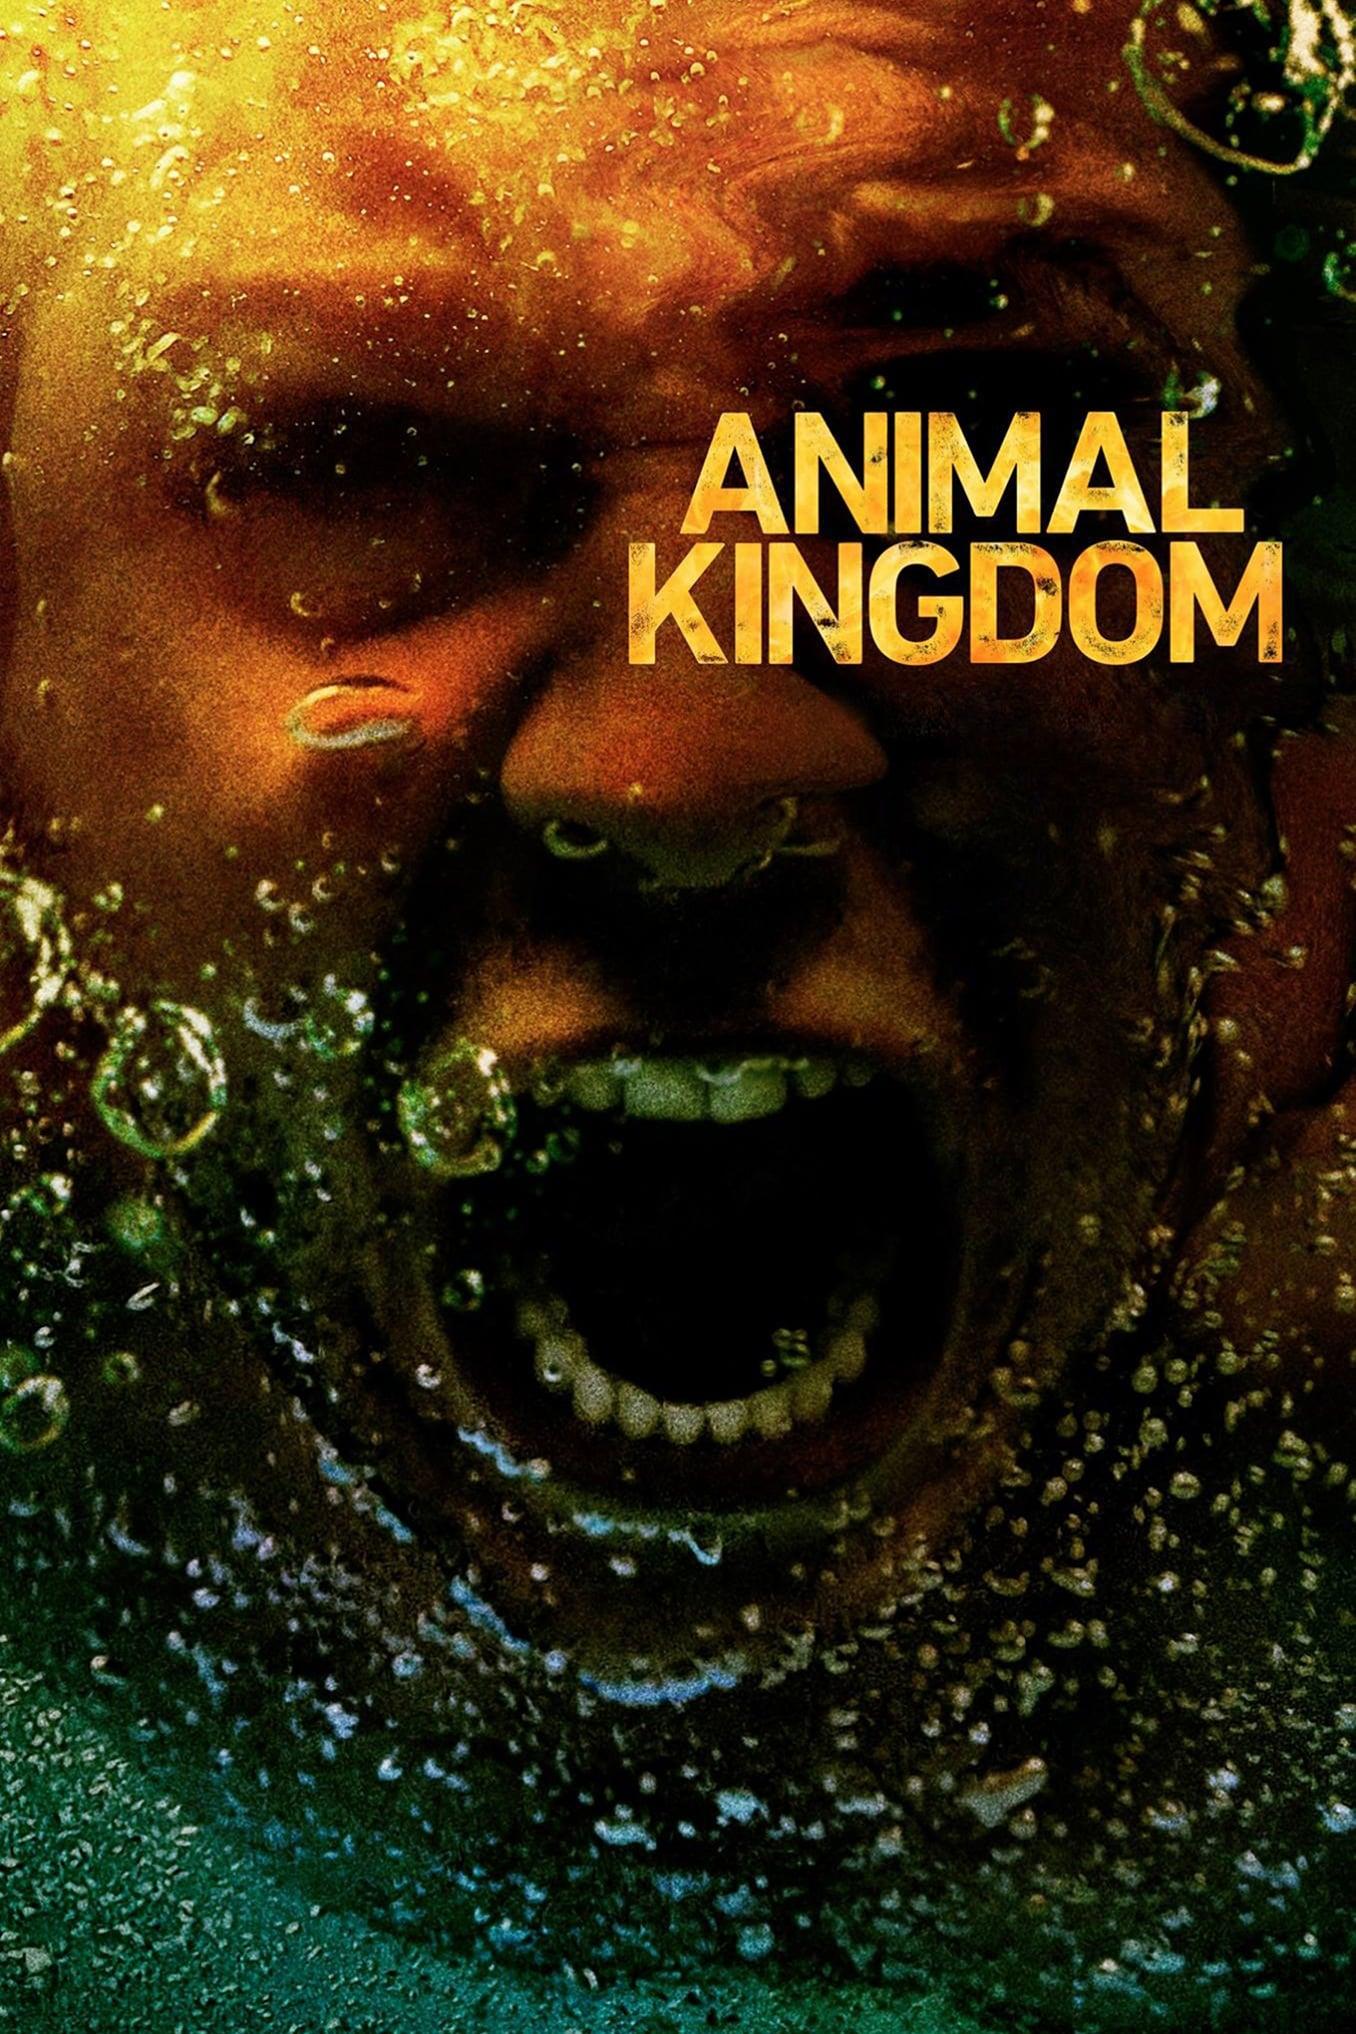 image for Animal Kingdom